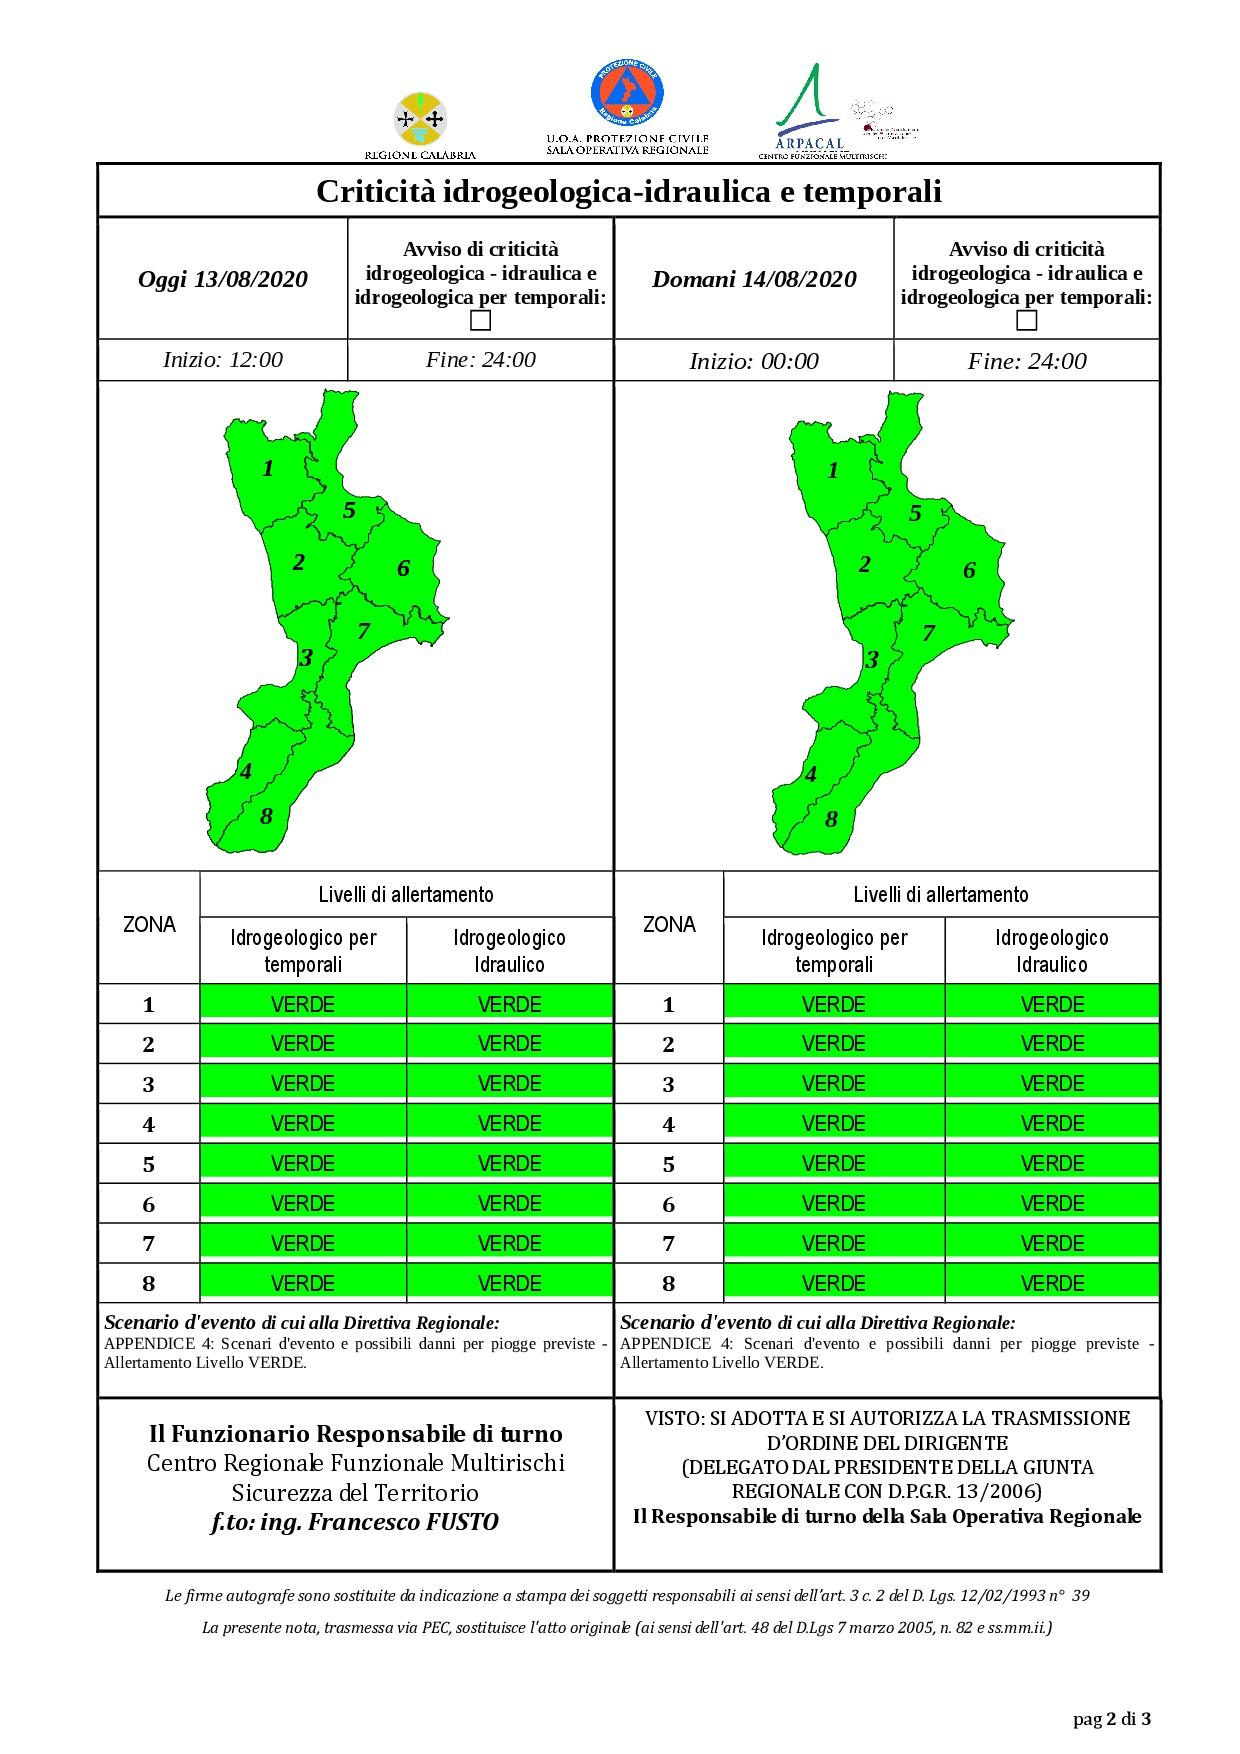 Criticità idrogeologica-idraulica e temporali in Calabria 13-08-2020